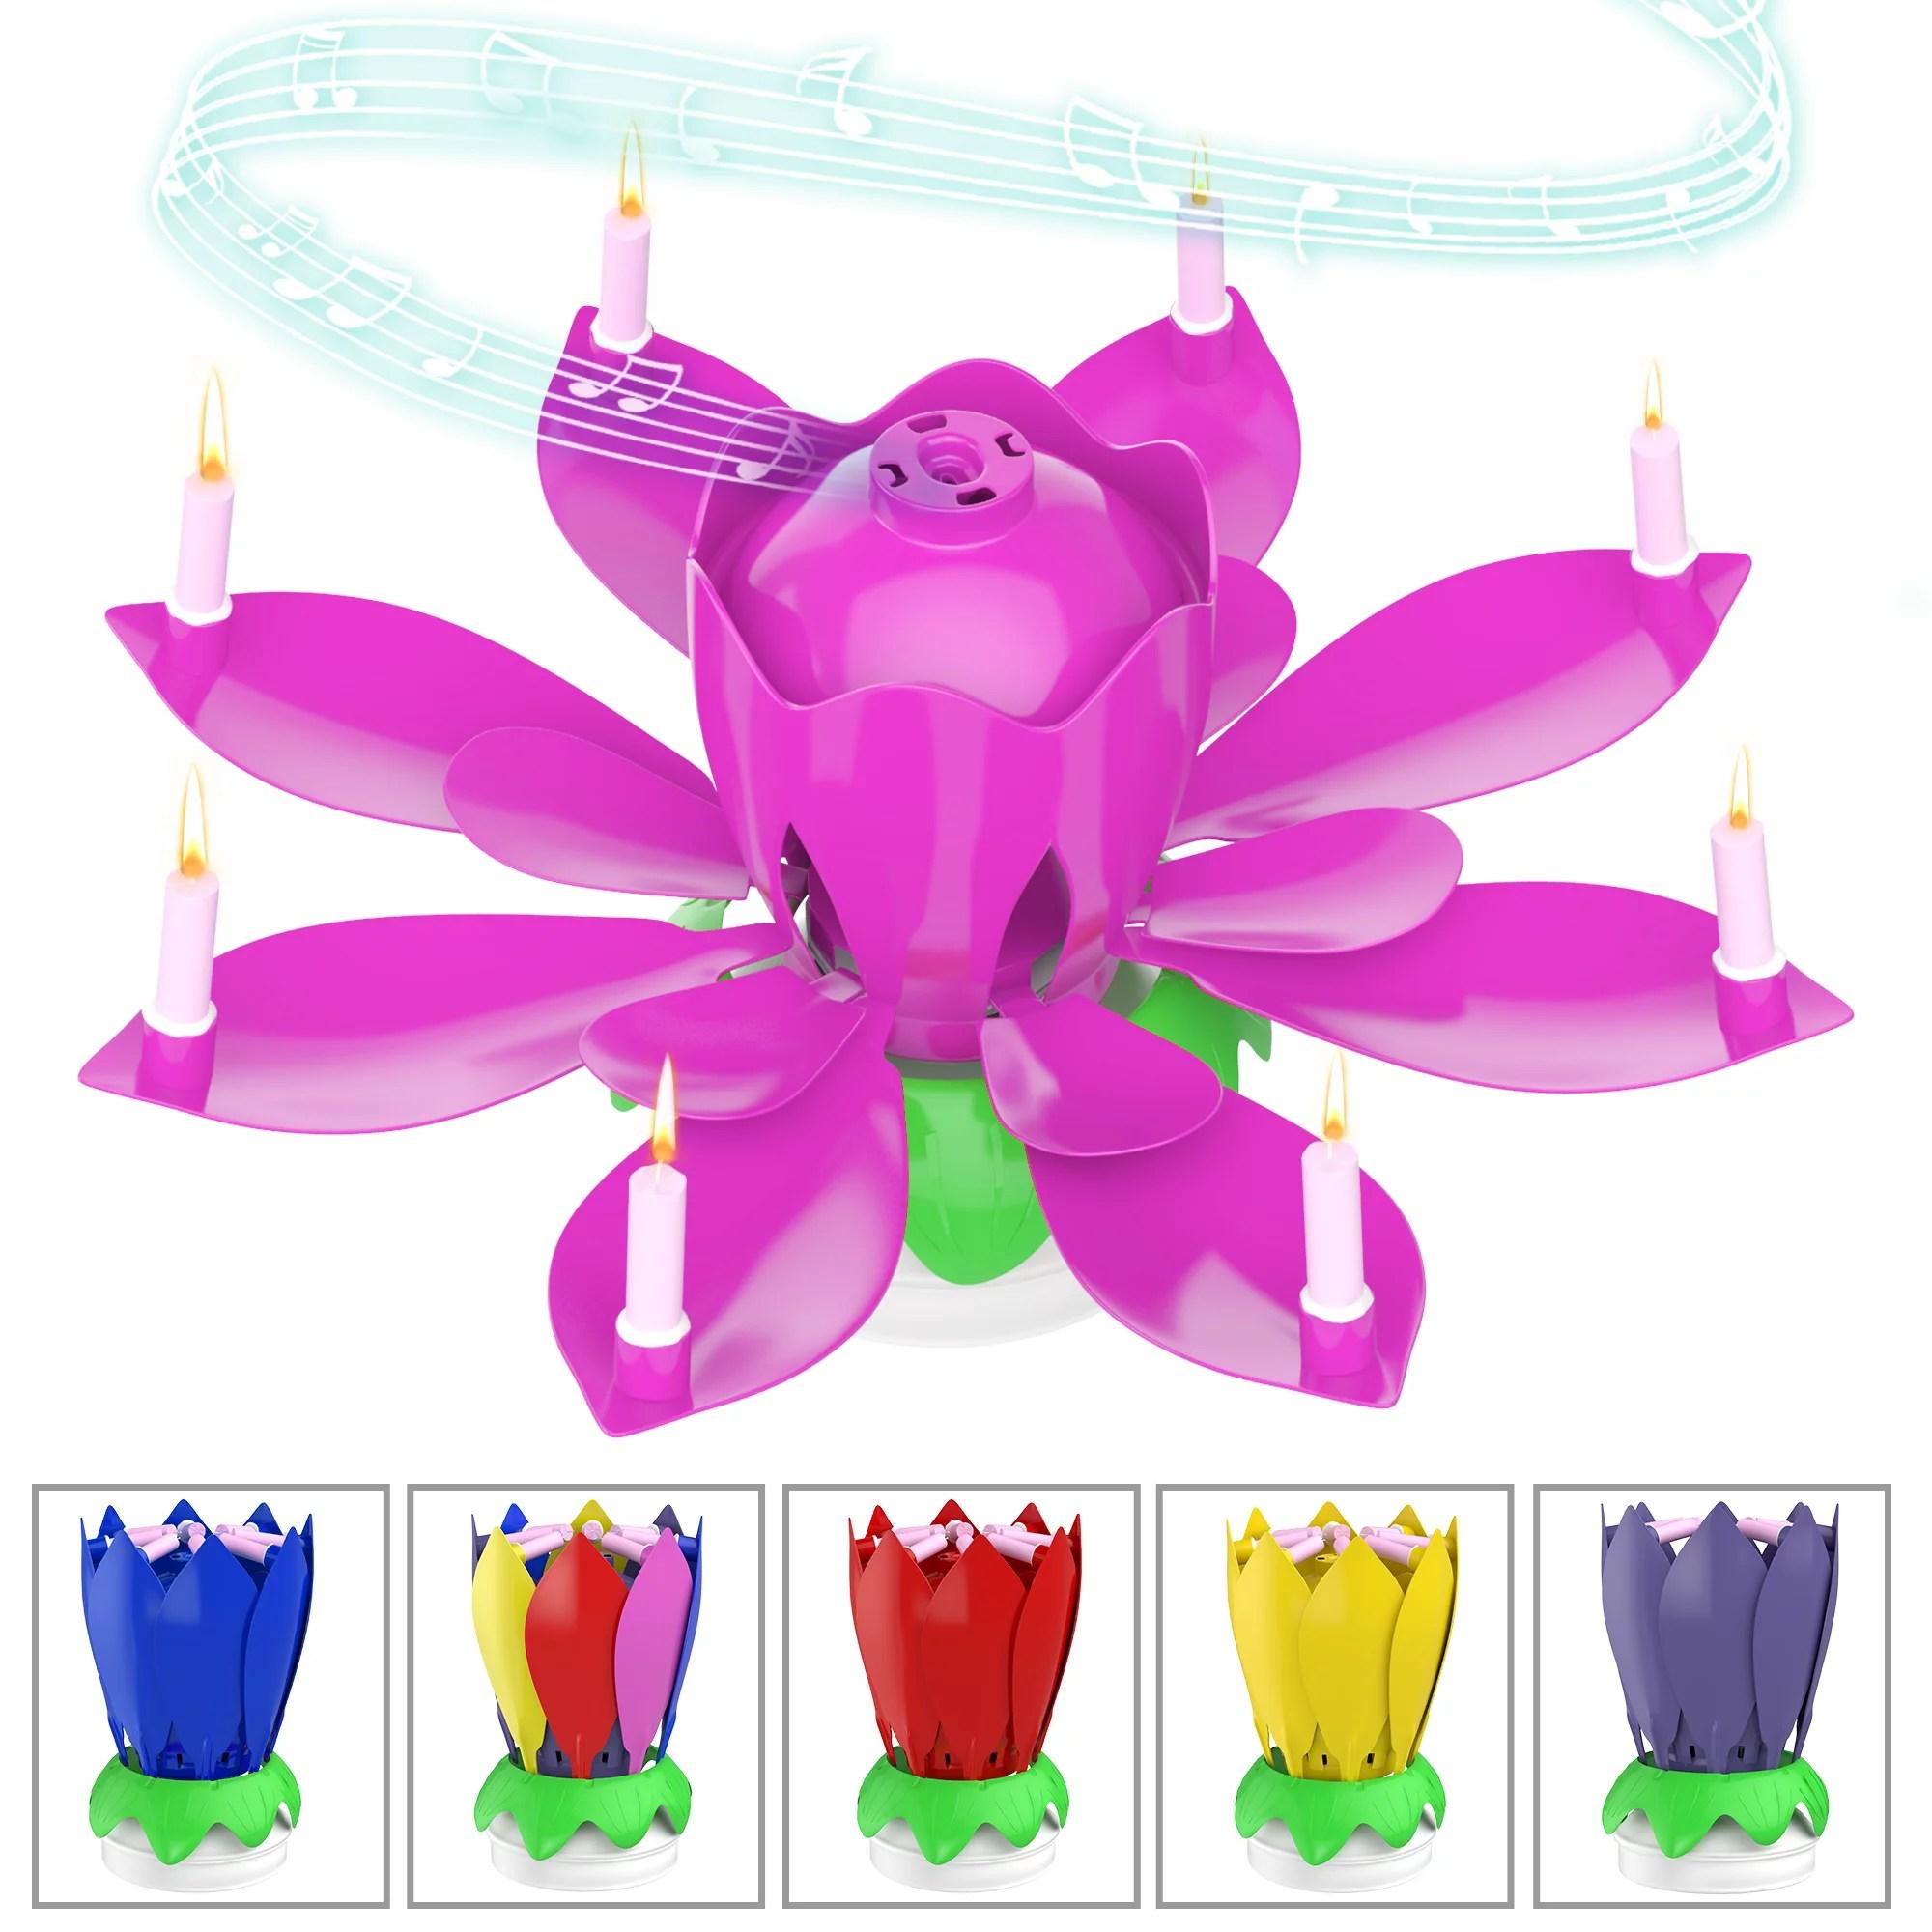 Nylea Birthday Cake Flower Candles With Happy Birthday Music Rotating Setup Pink Walmart Com Walmart Com